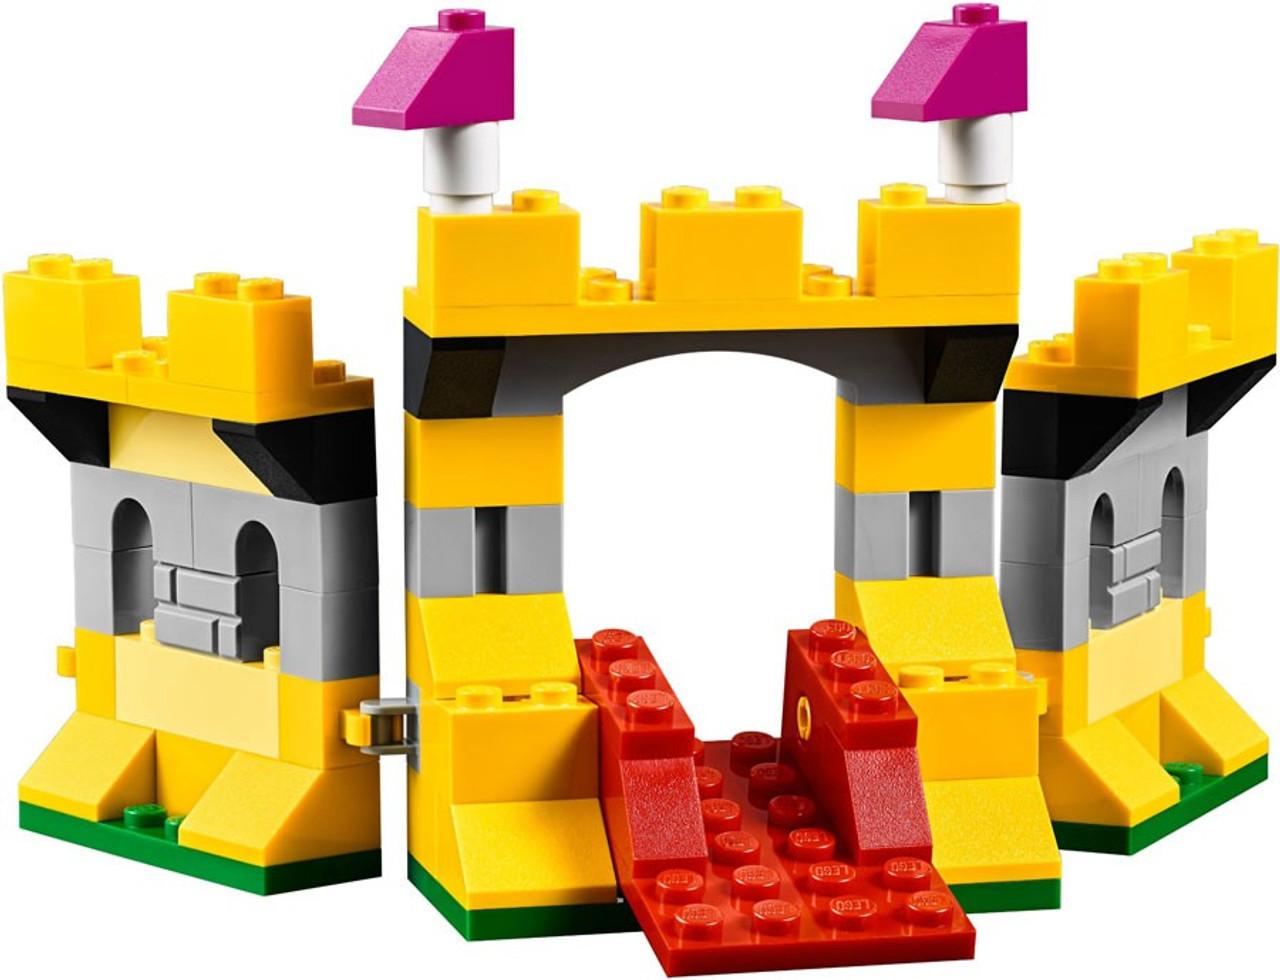 LEGO Classic Bricks Exclusive Set 10717 - ToyWiz